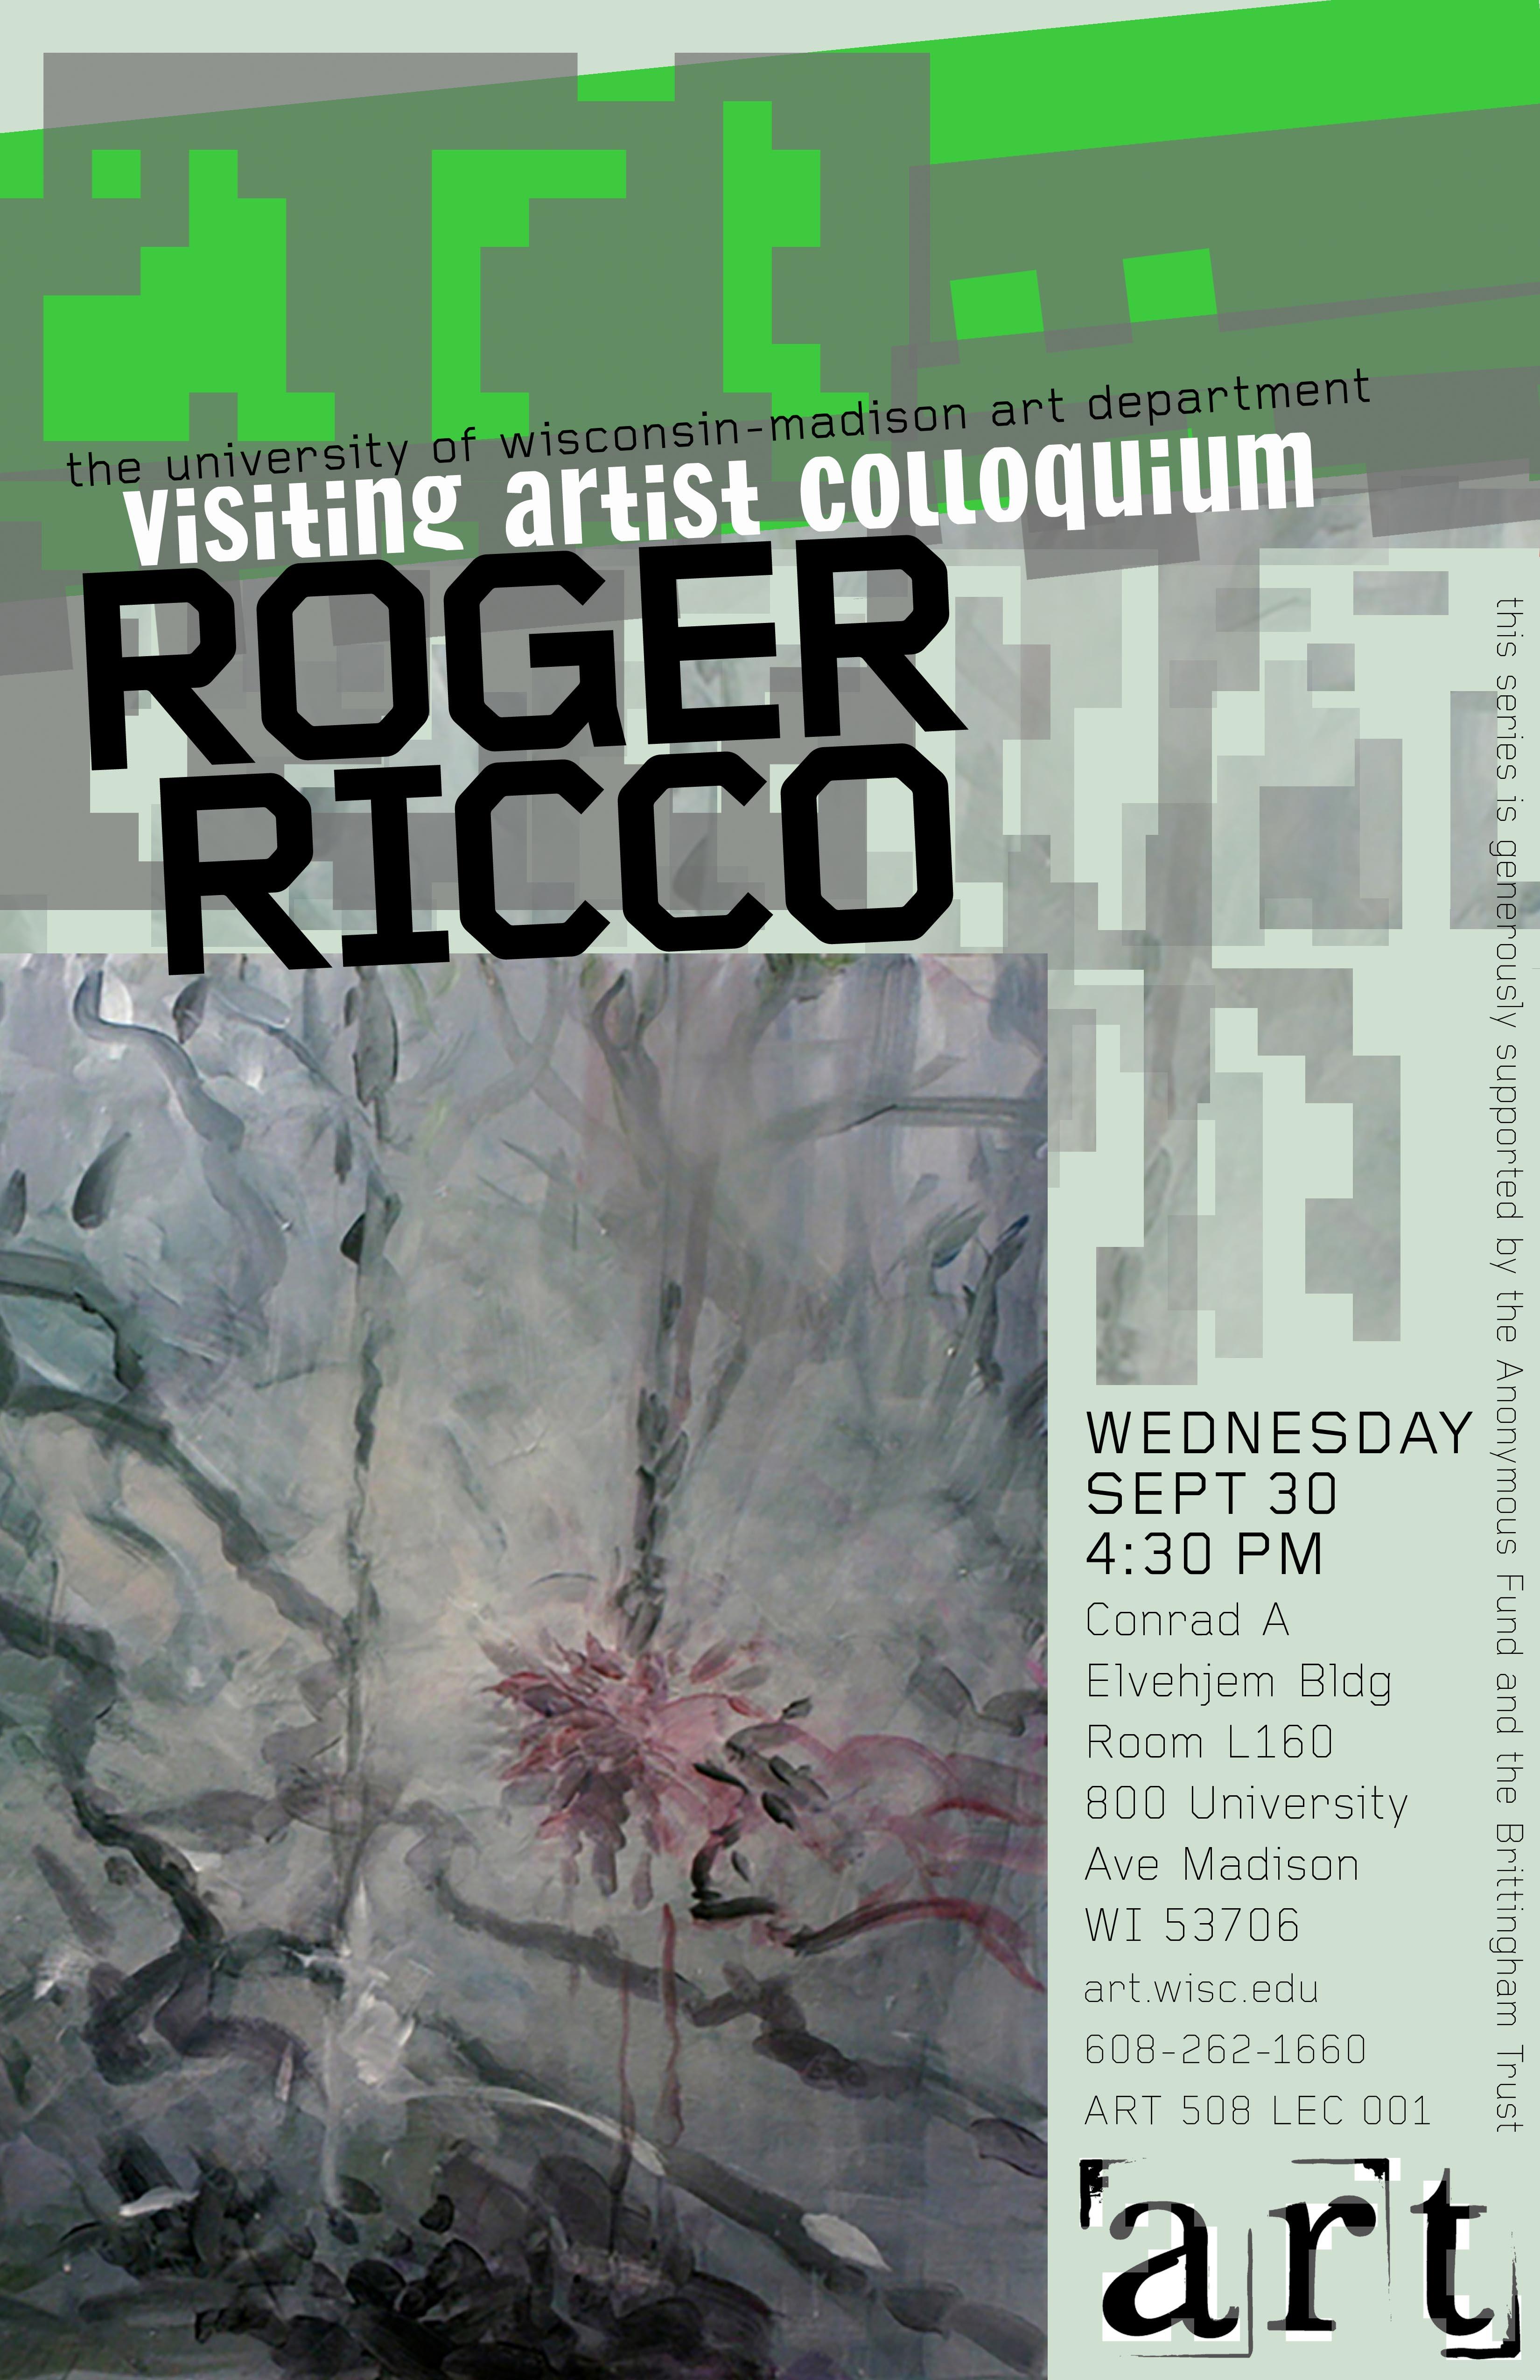 Poster 5 Roger Ricco4